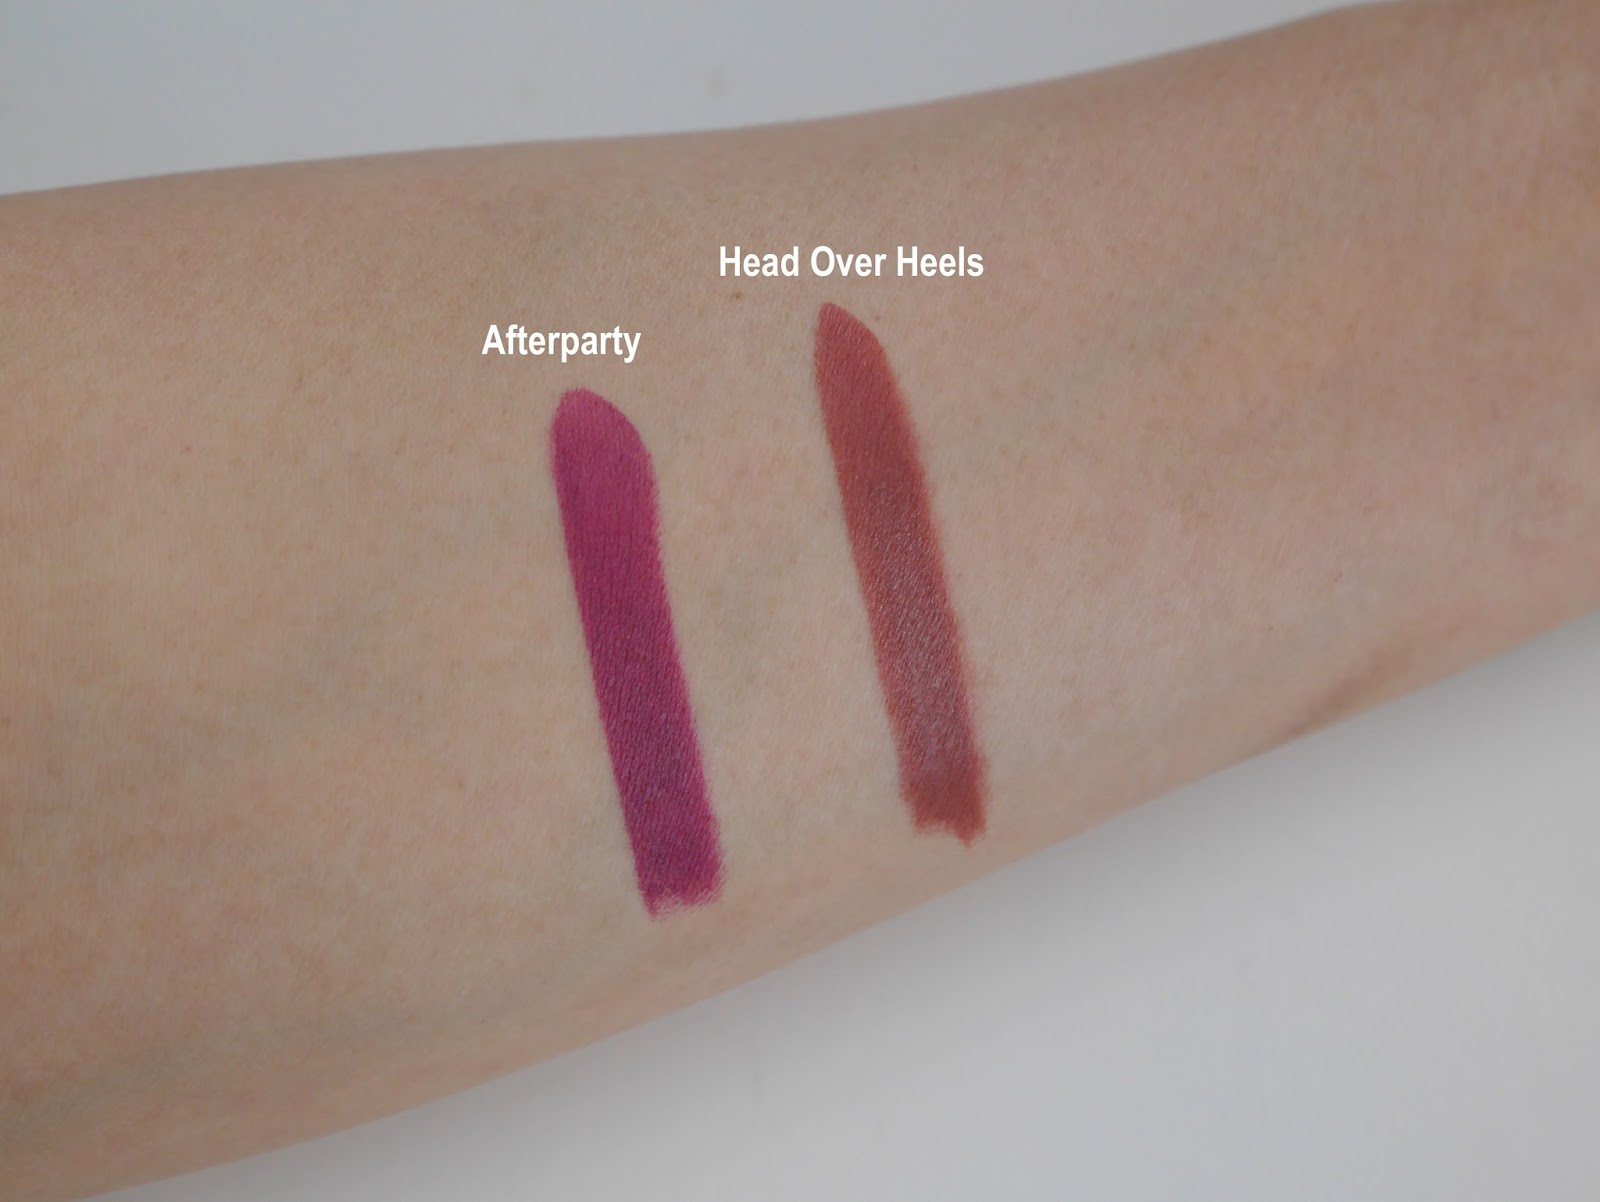 Canadianbeauty, bbloggers, lipstick, beauty, makeup, bbloggersCA